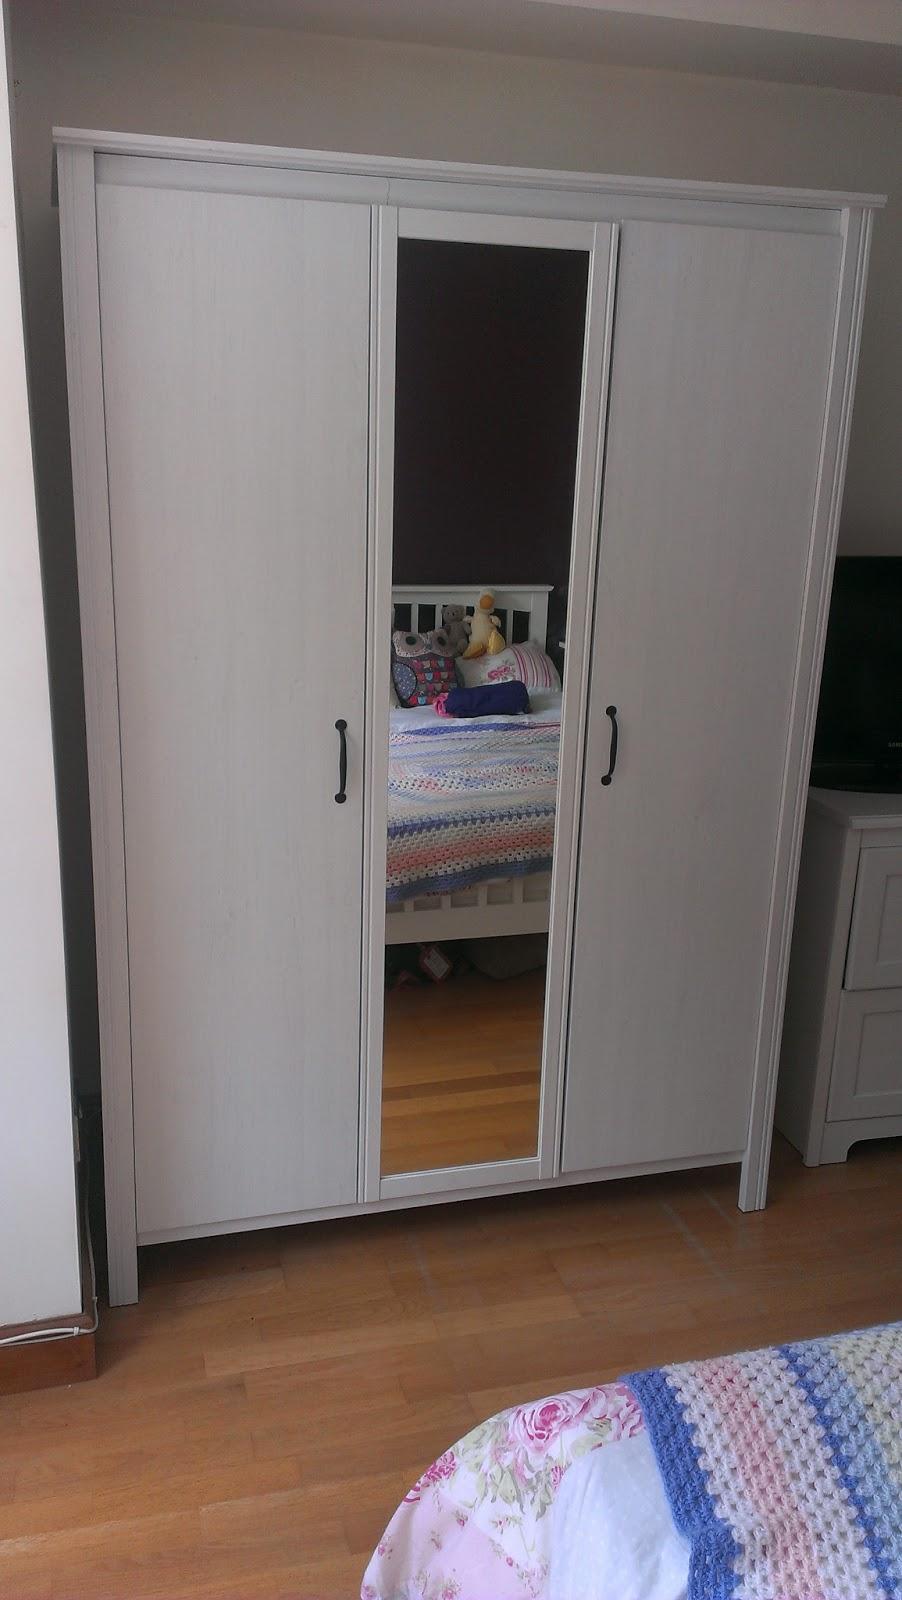 ikea aspelund wardrobe inside. Black Bedroom Furniture Sets. Home Design Ideas